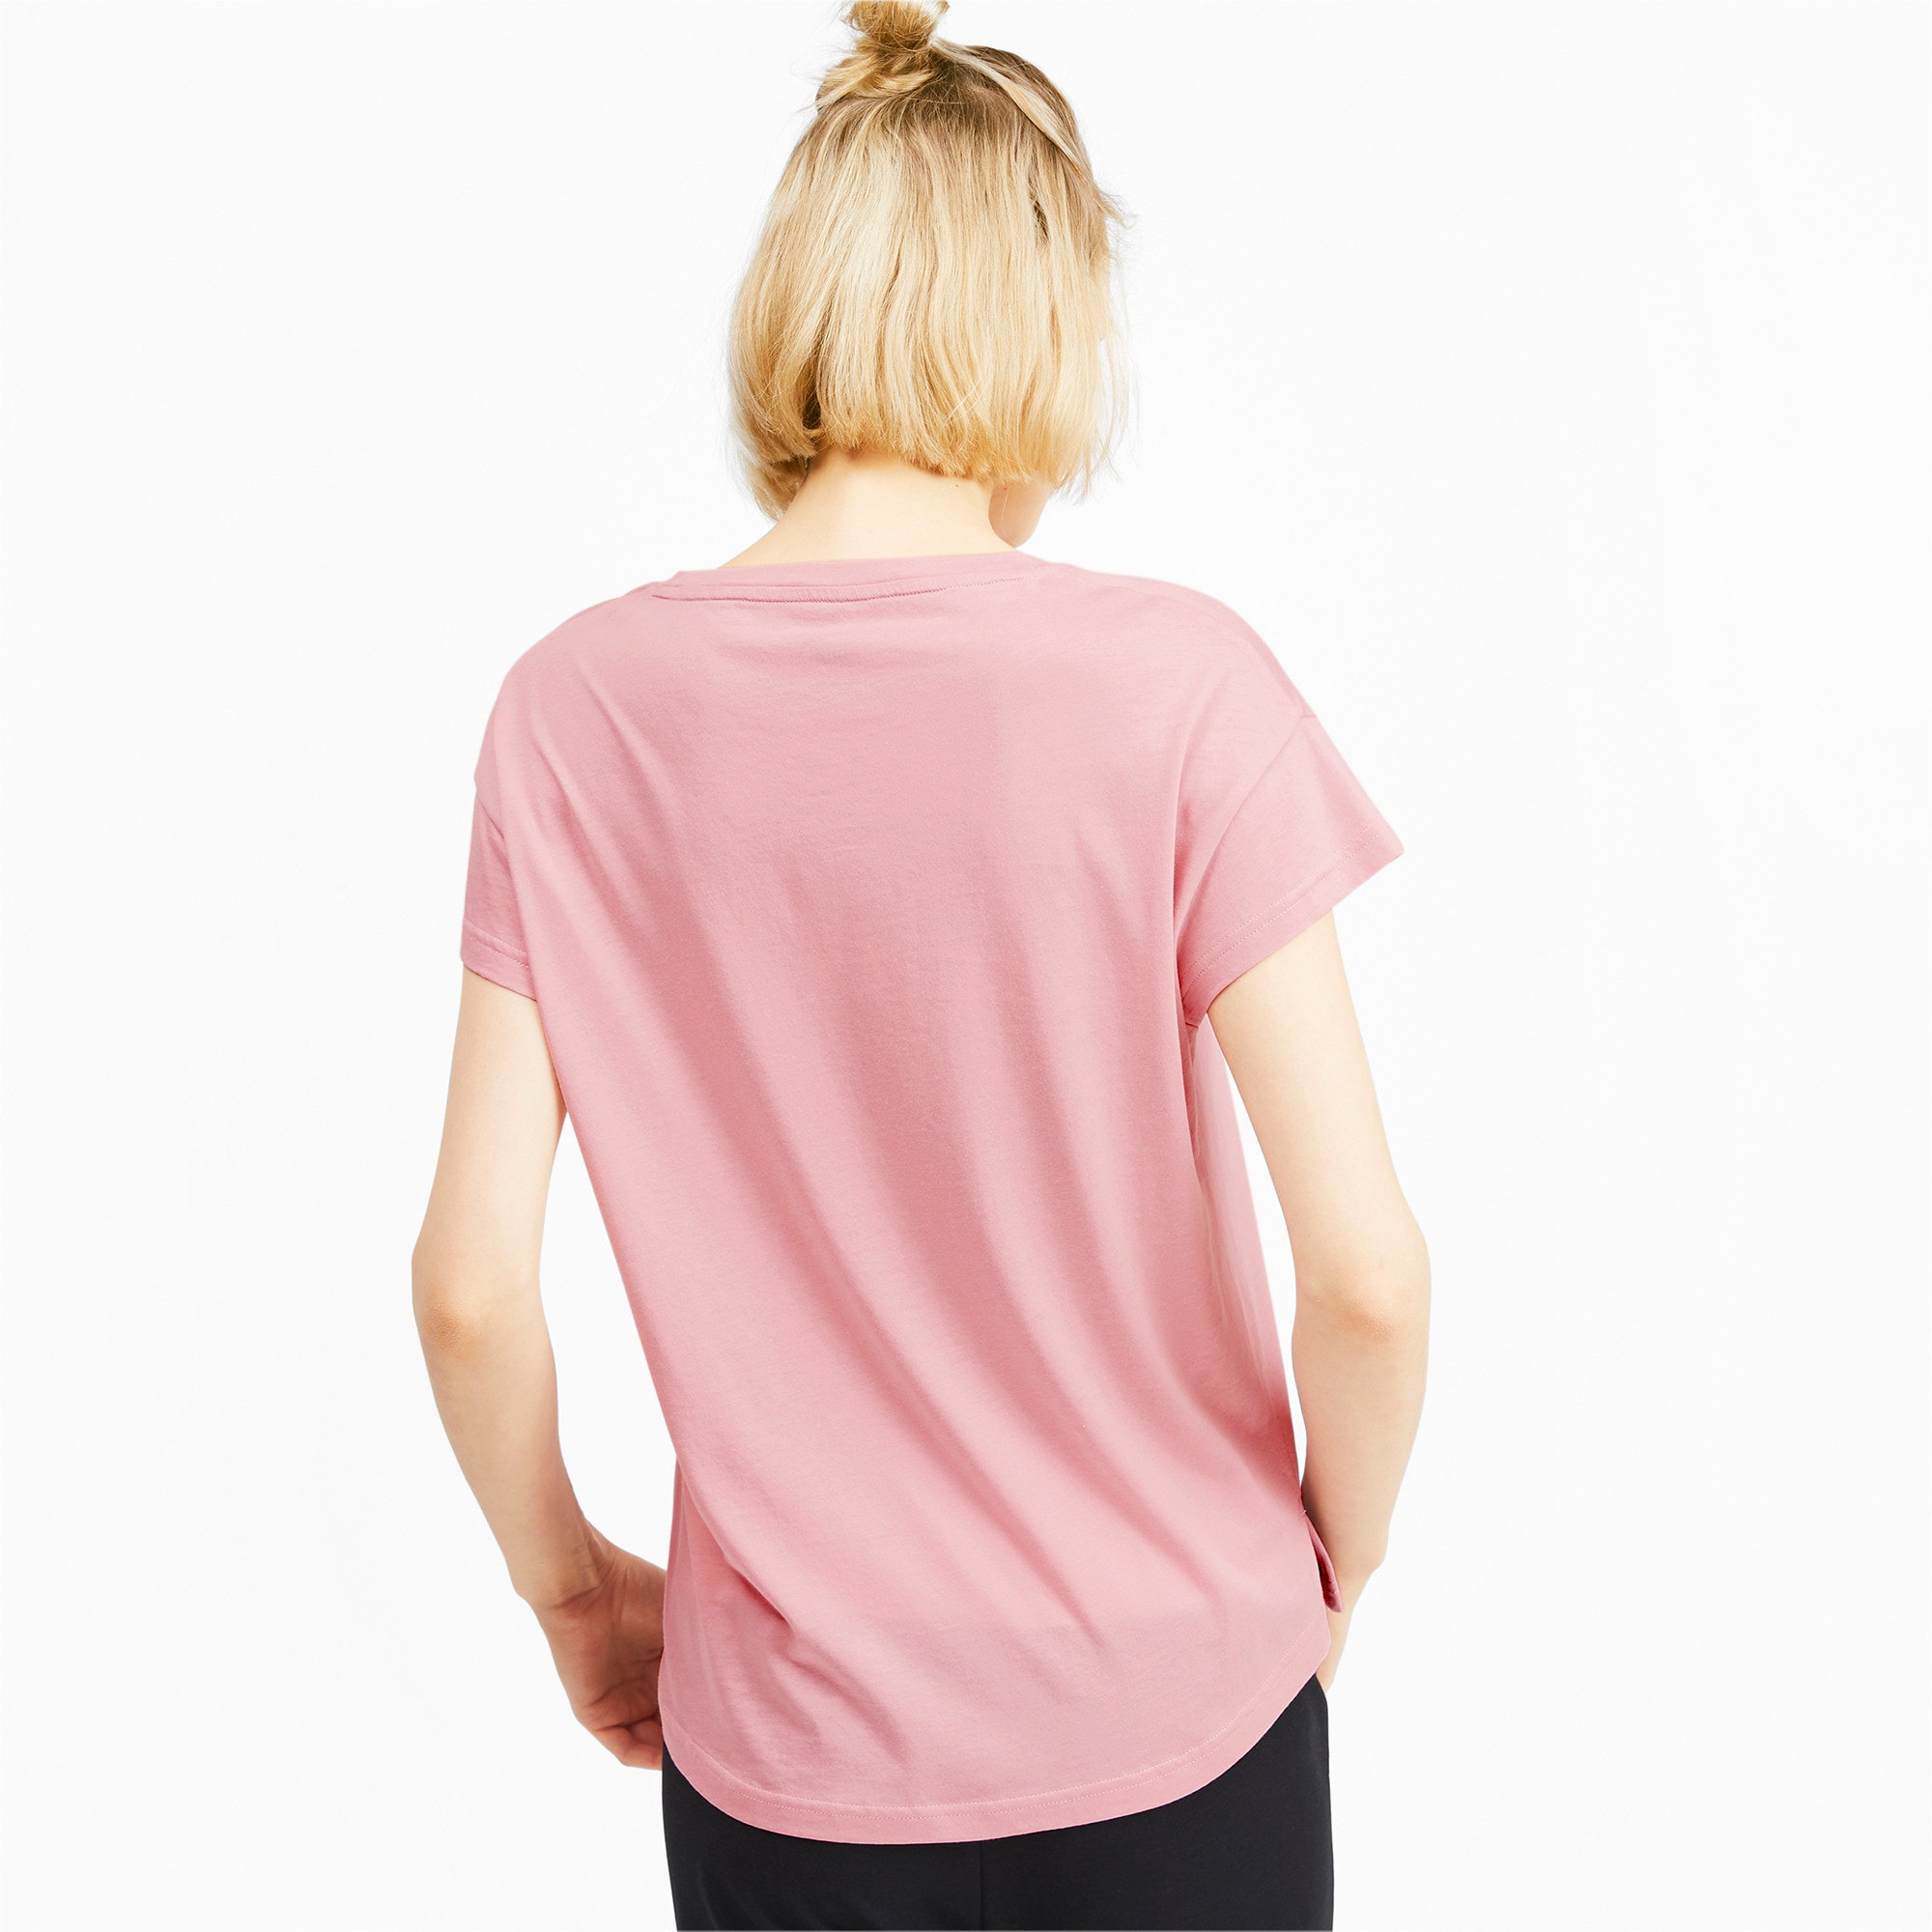 Miniatura 2 de Camiseta estampadaModernSports de mujer, Bridal Rose, mediano